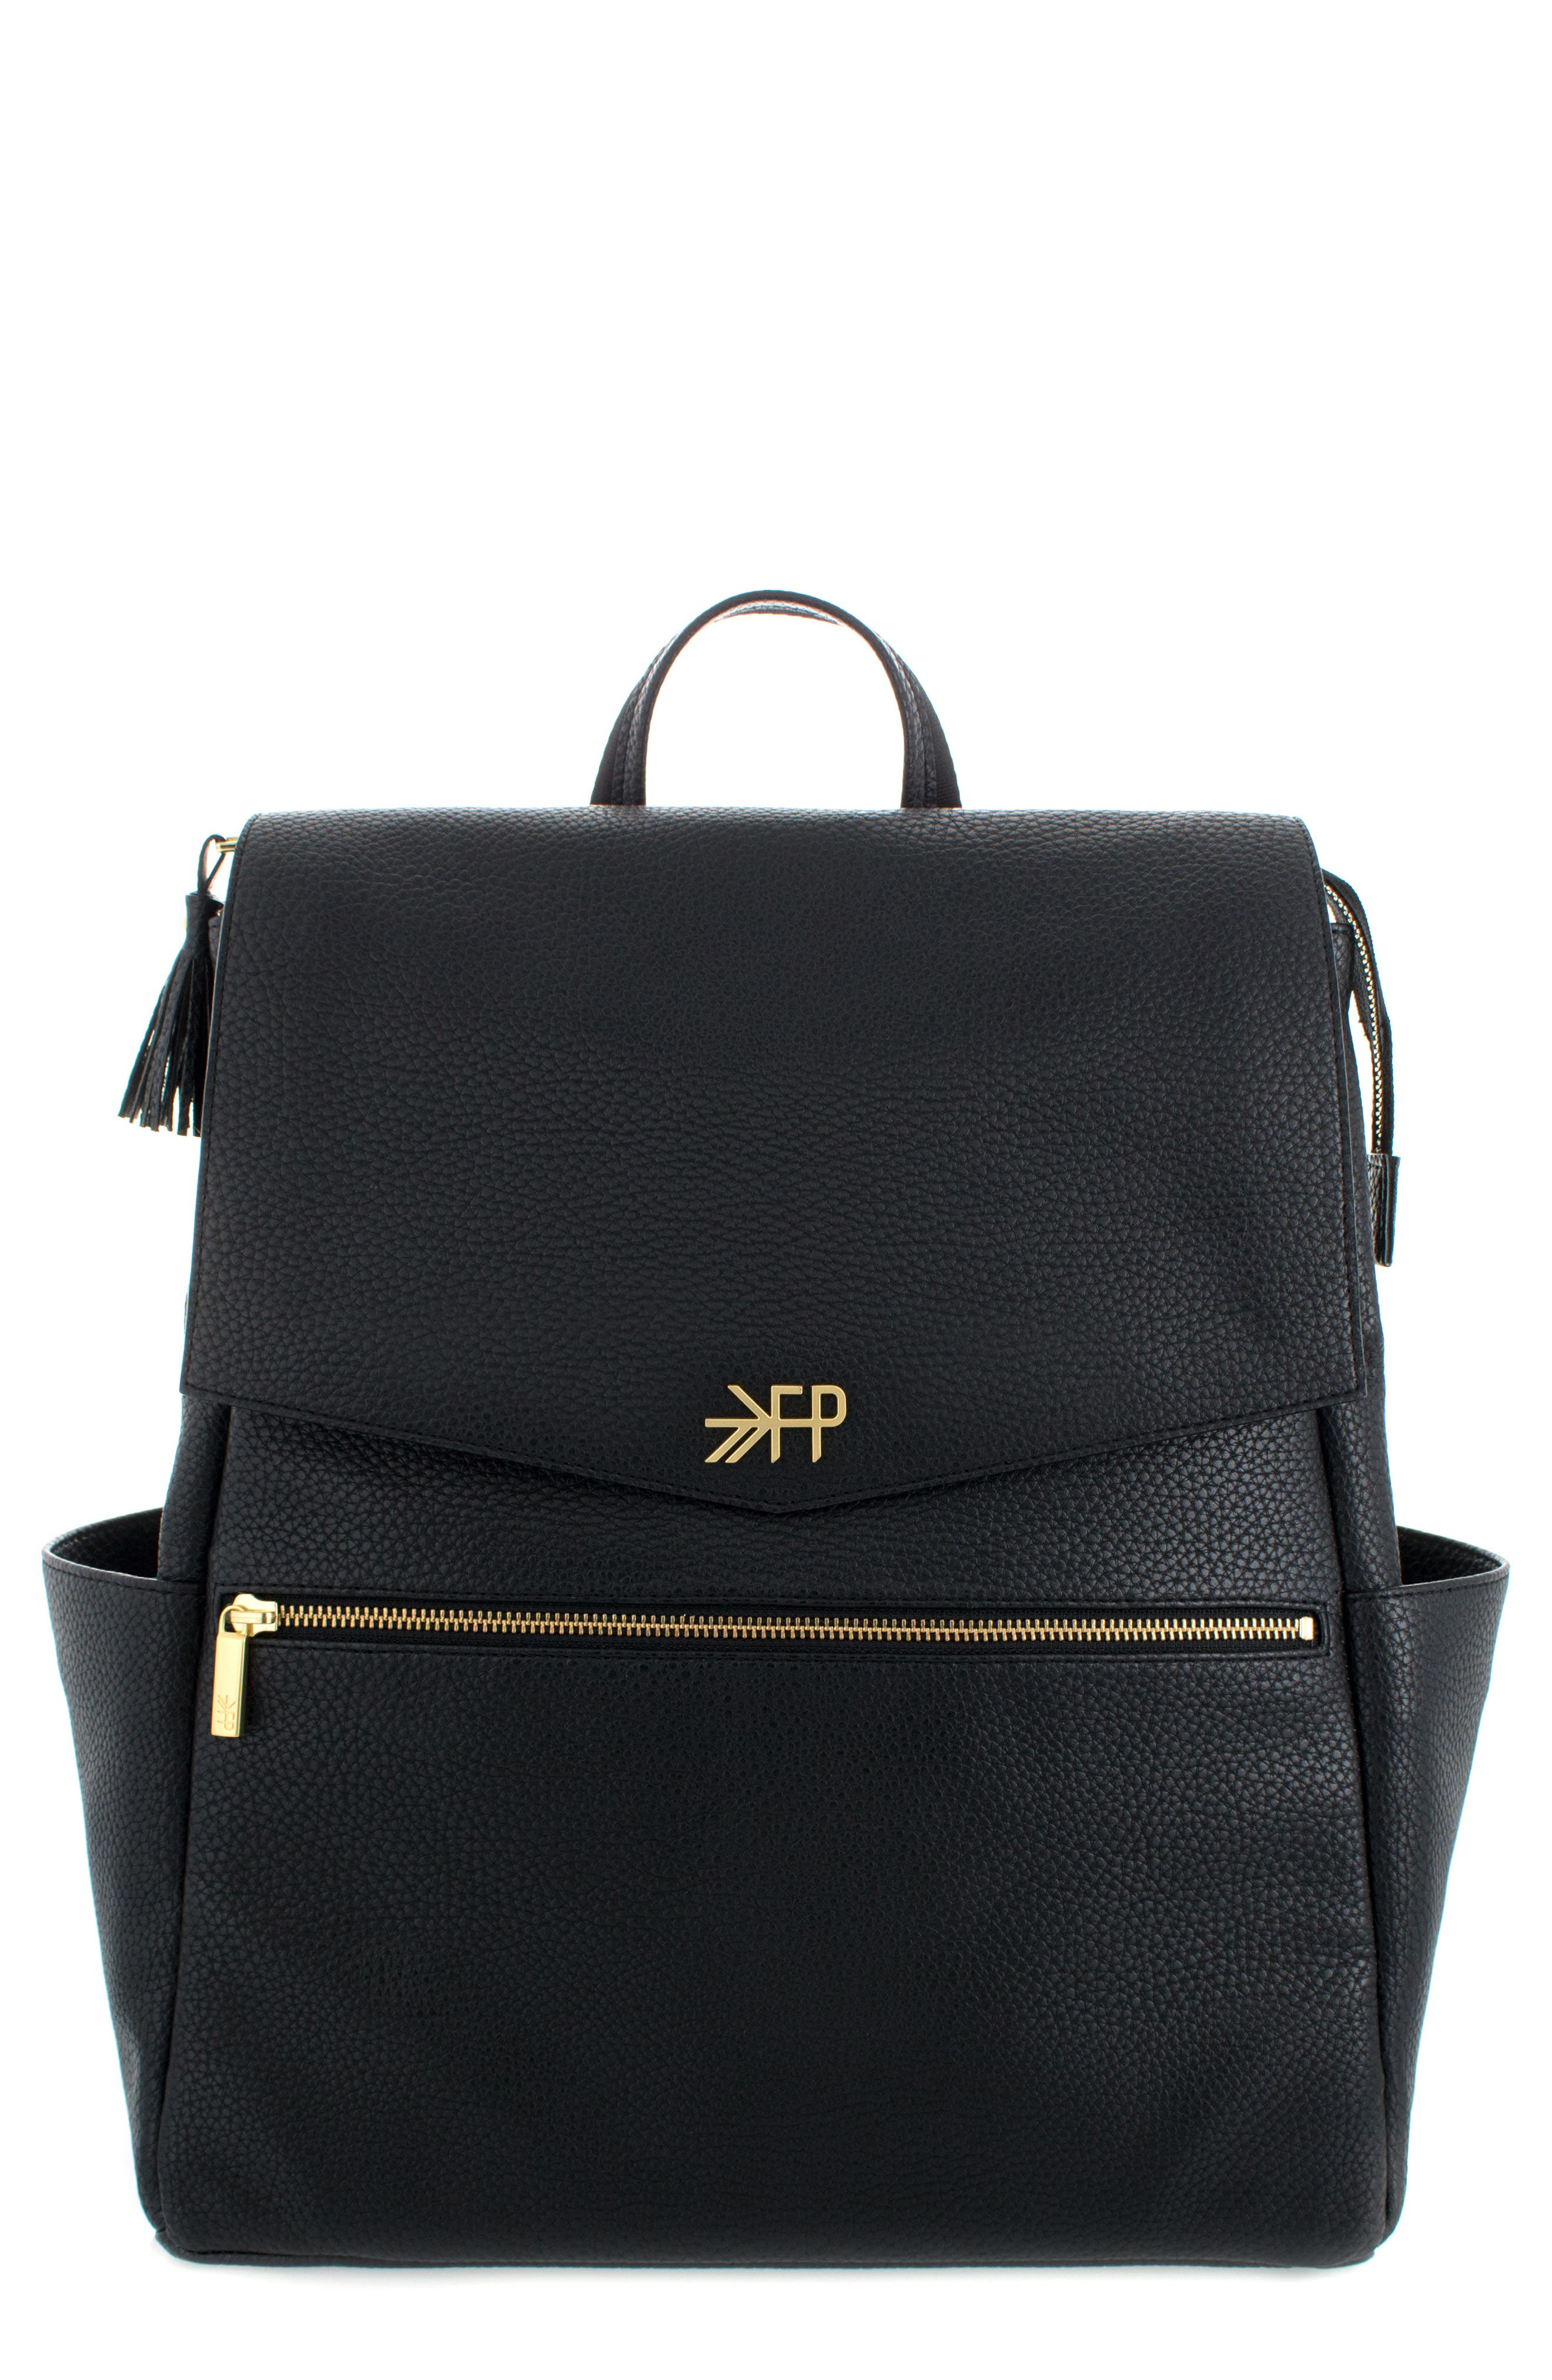 Convertible Diaper Backpack,                             Main thumbnail 1, color,                             EBONY